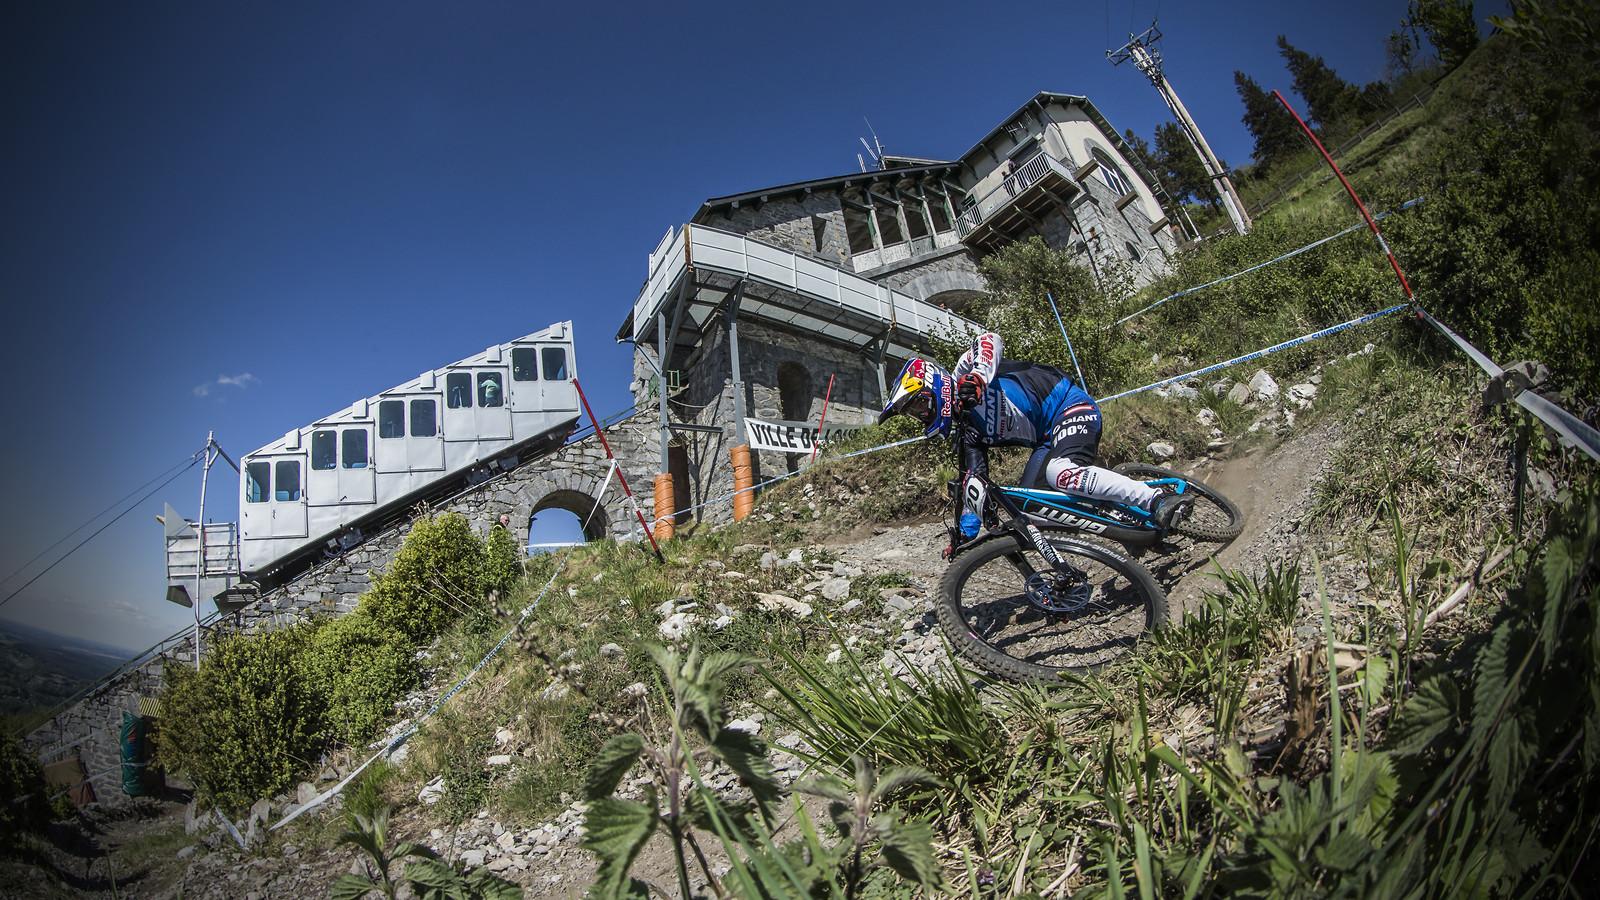 34367285142 a9a52de197 o - phunkt.com - Mountain Biking Pictures - Vital MTB